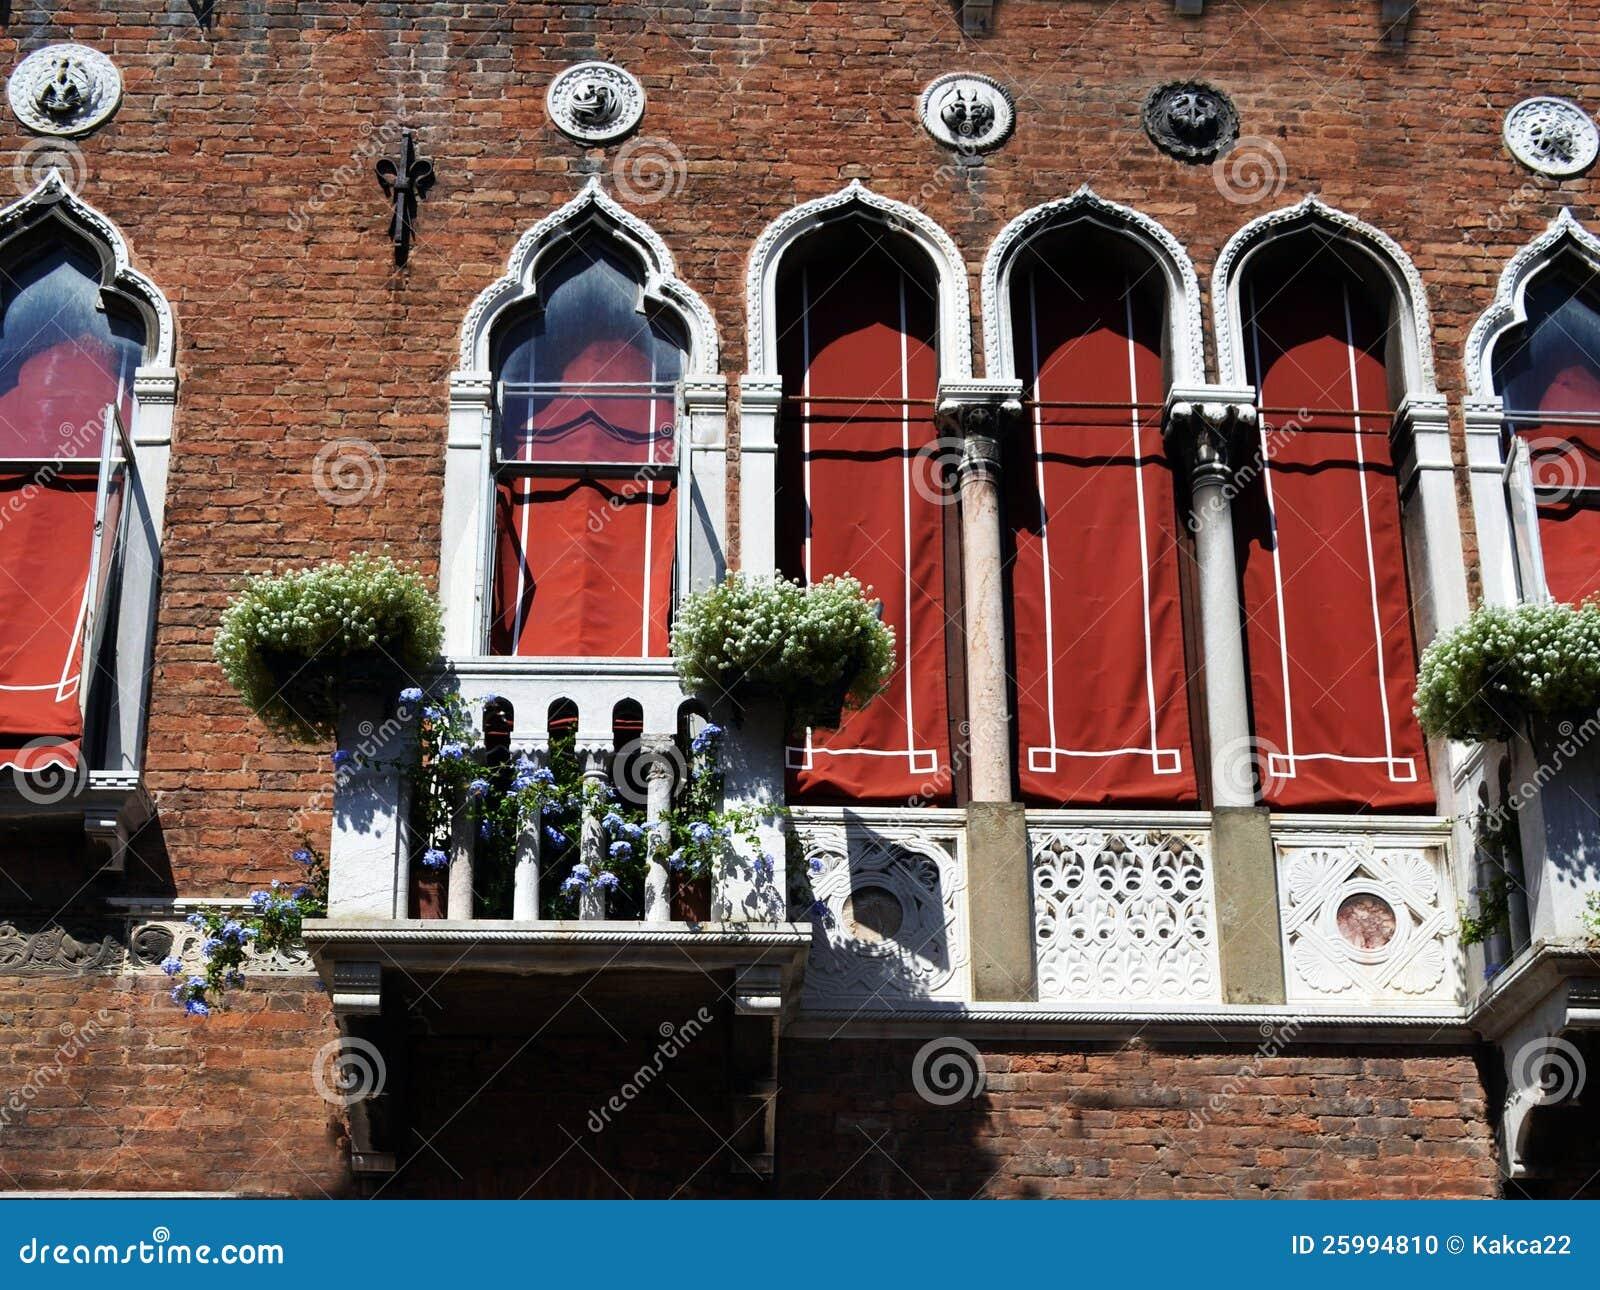 Finestre veneziane fotografia stock immagine 25994810 - Veneziane per finestre prezzi ...